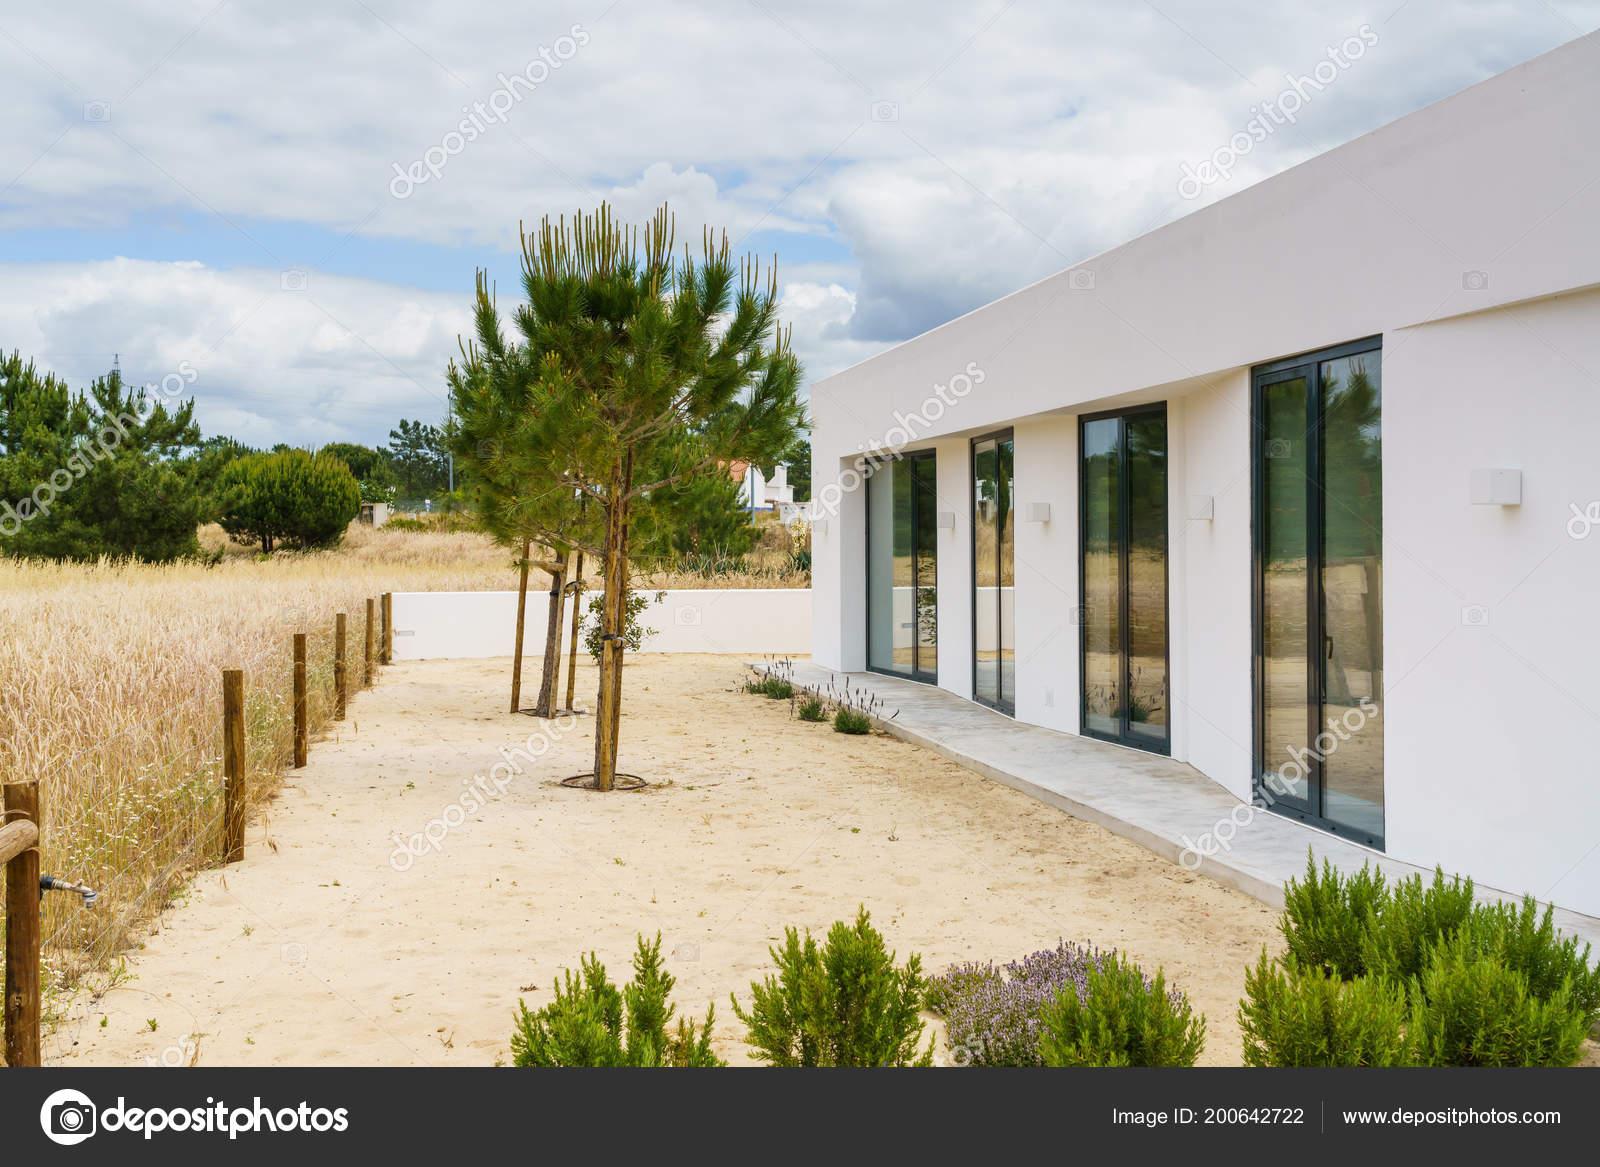 Maison Moderne Avec Jardin Piscine Terrasse Bois Photographie